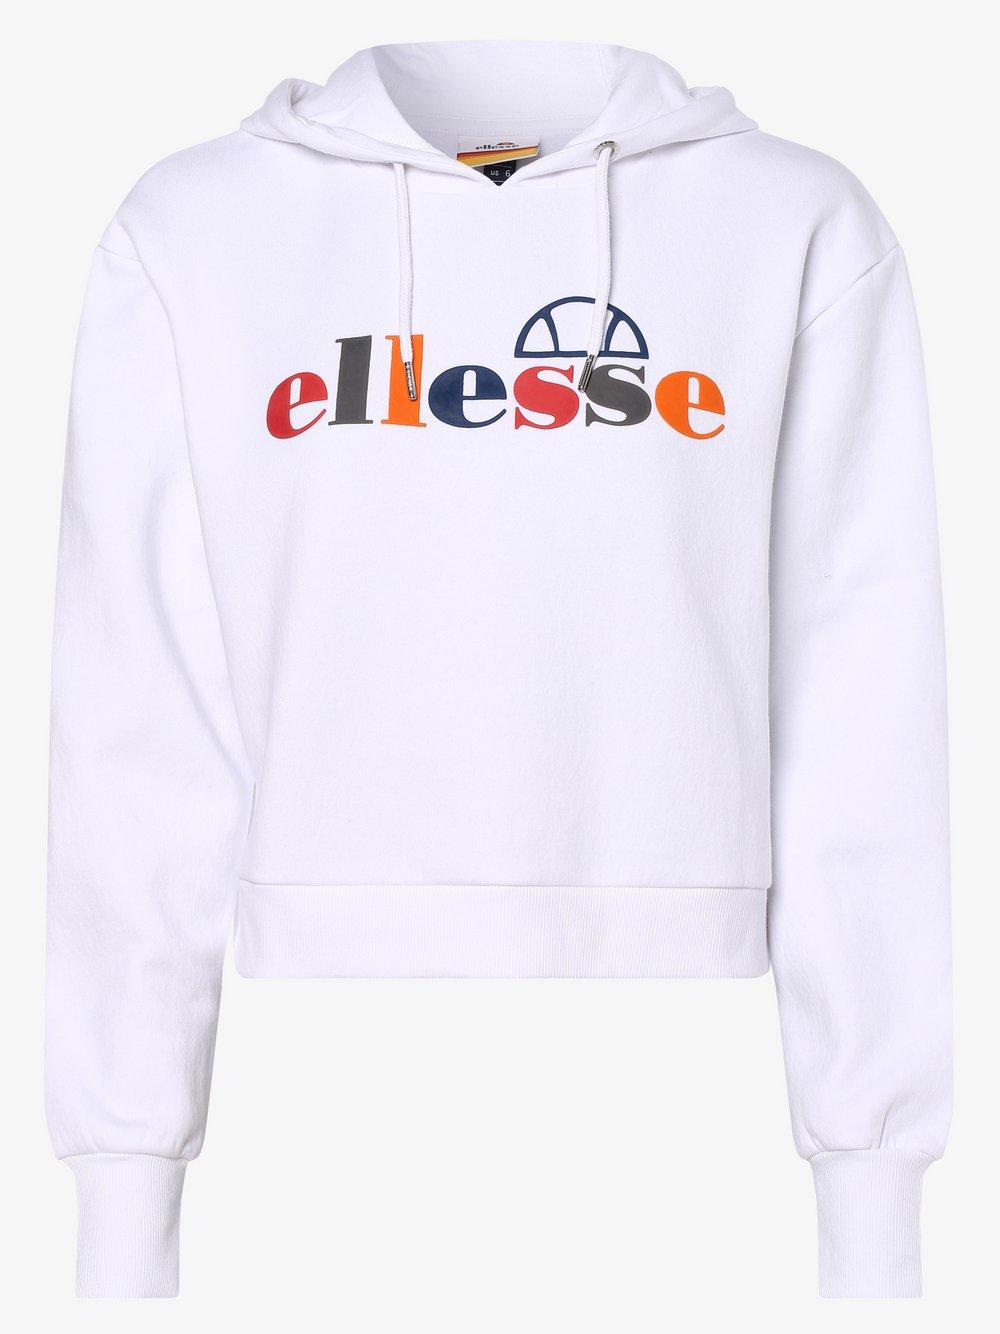 ellesse - Damska bluza nierozpinana – Gaetana, biały